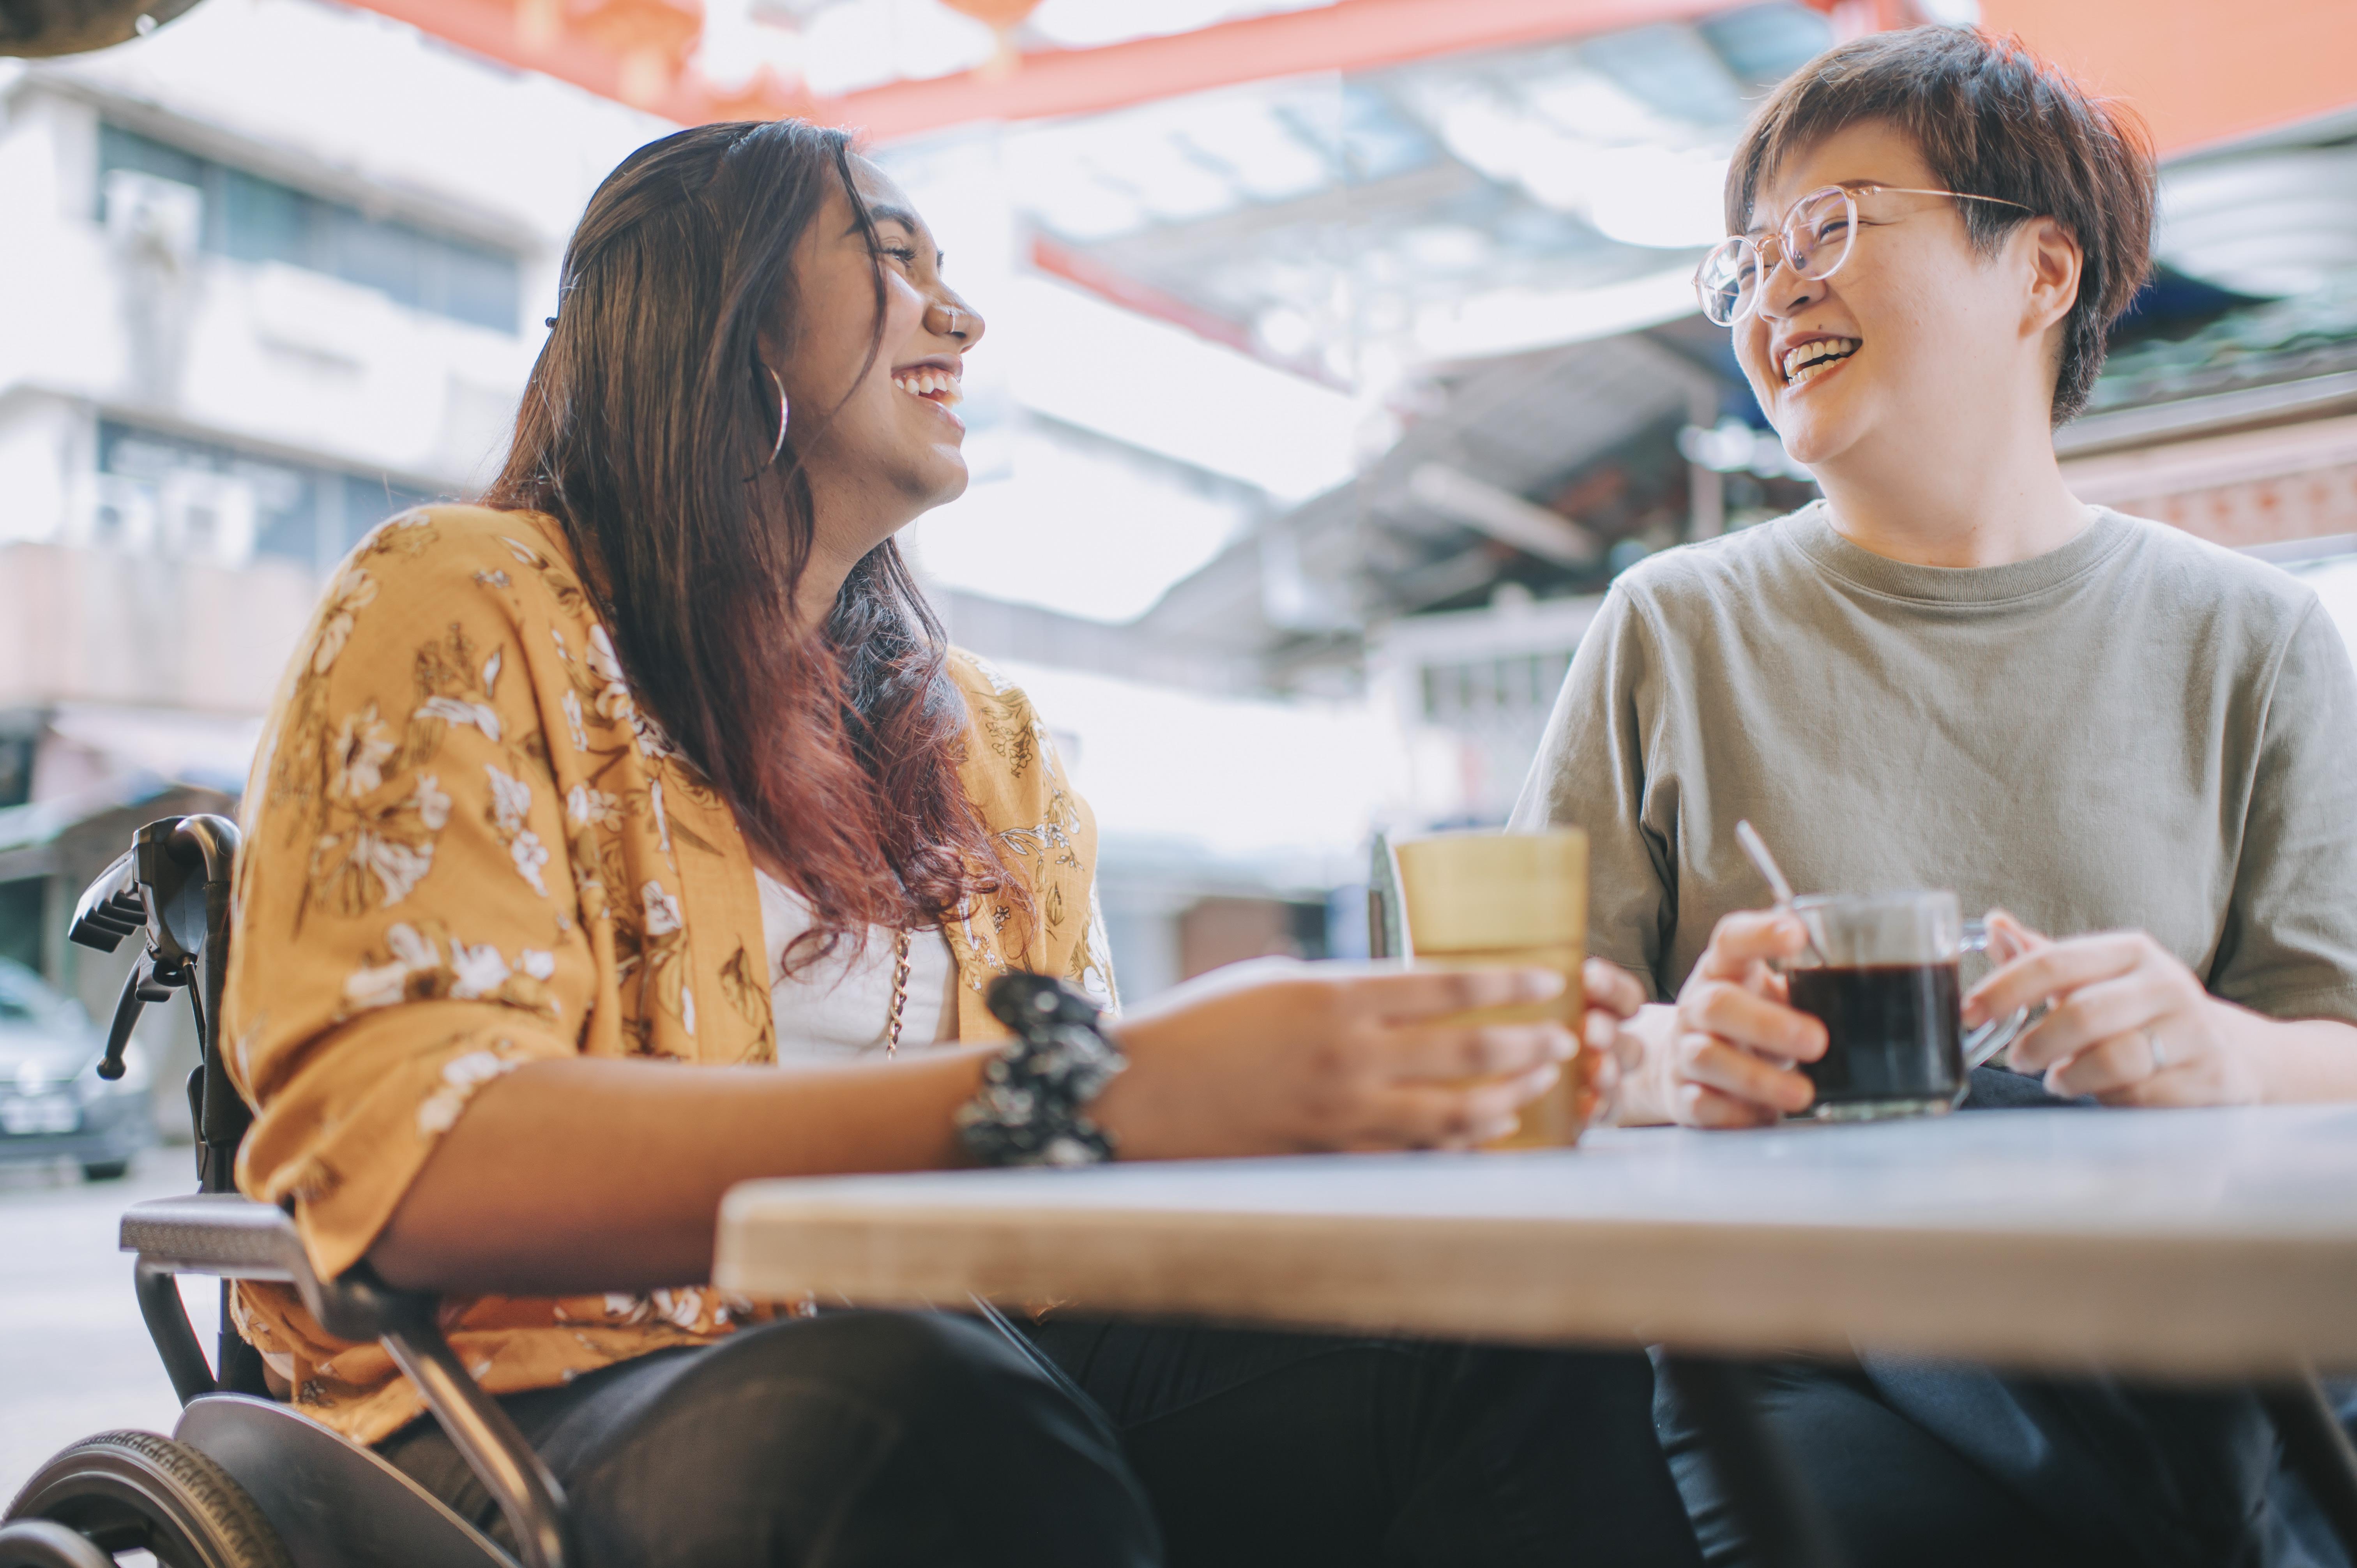 Women in wheelchair having coffee with friend